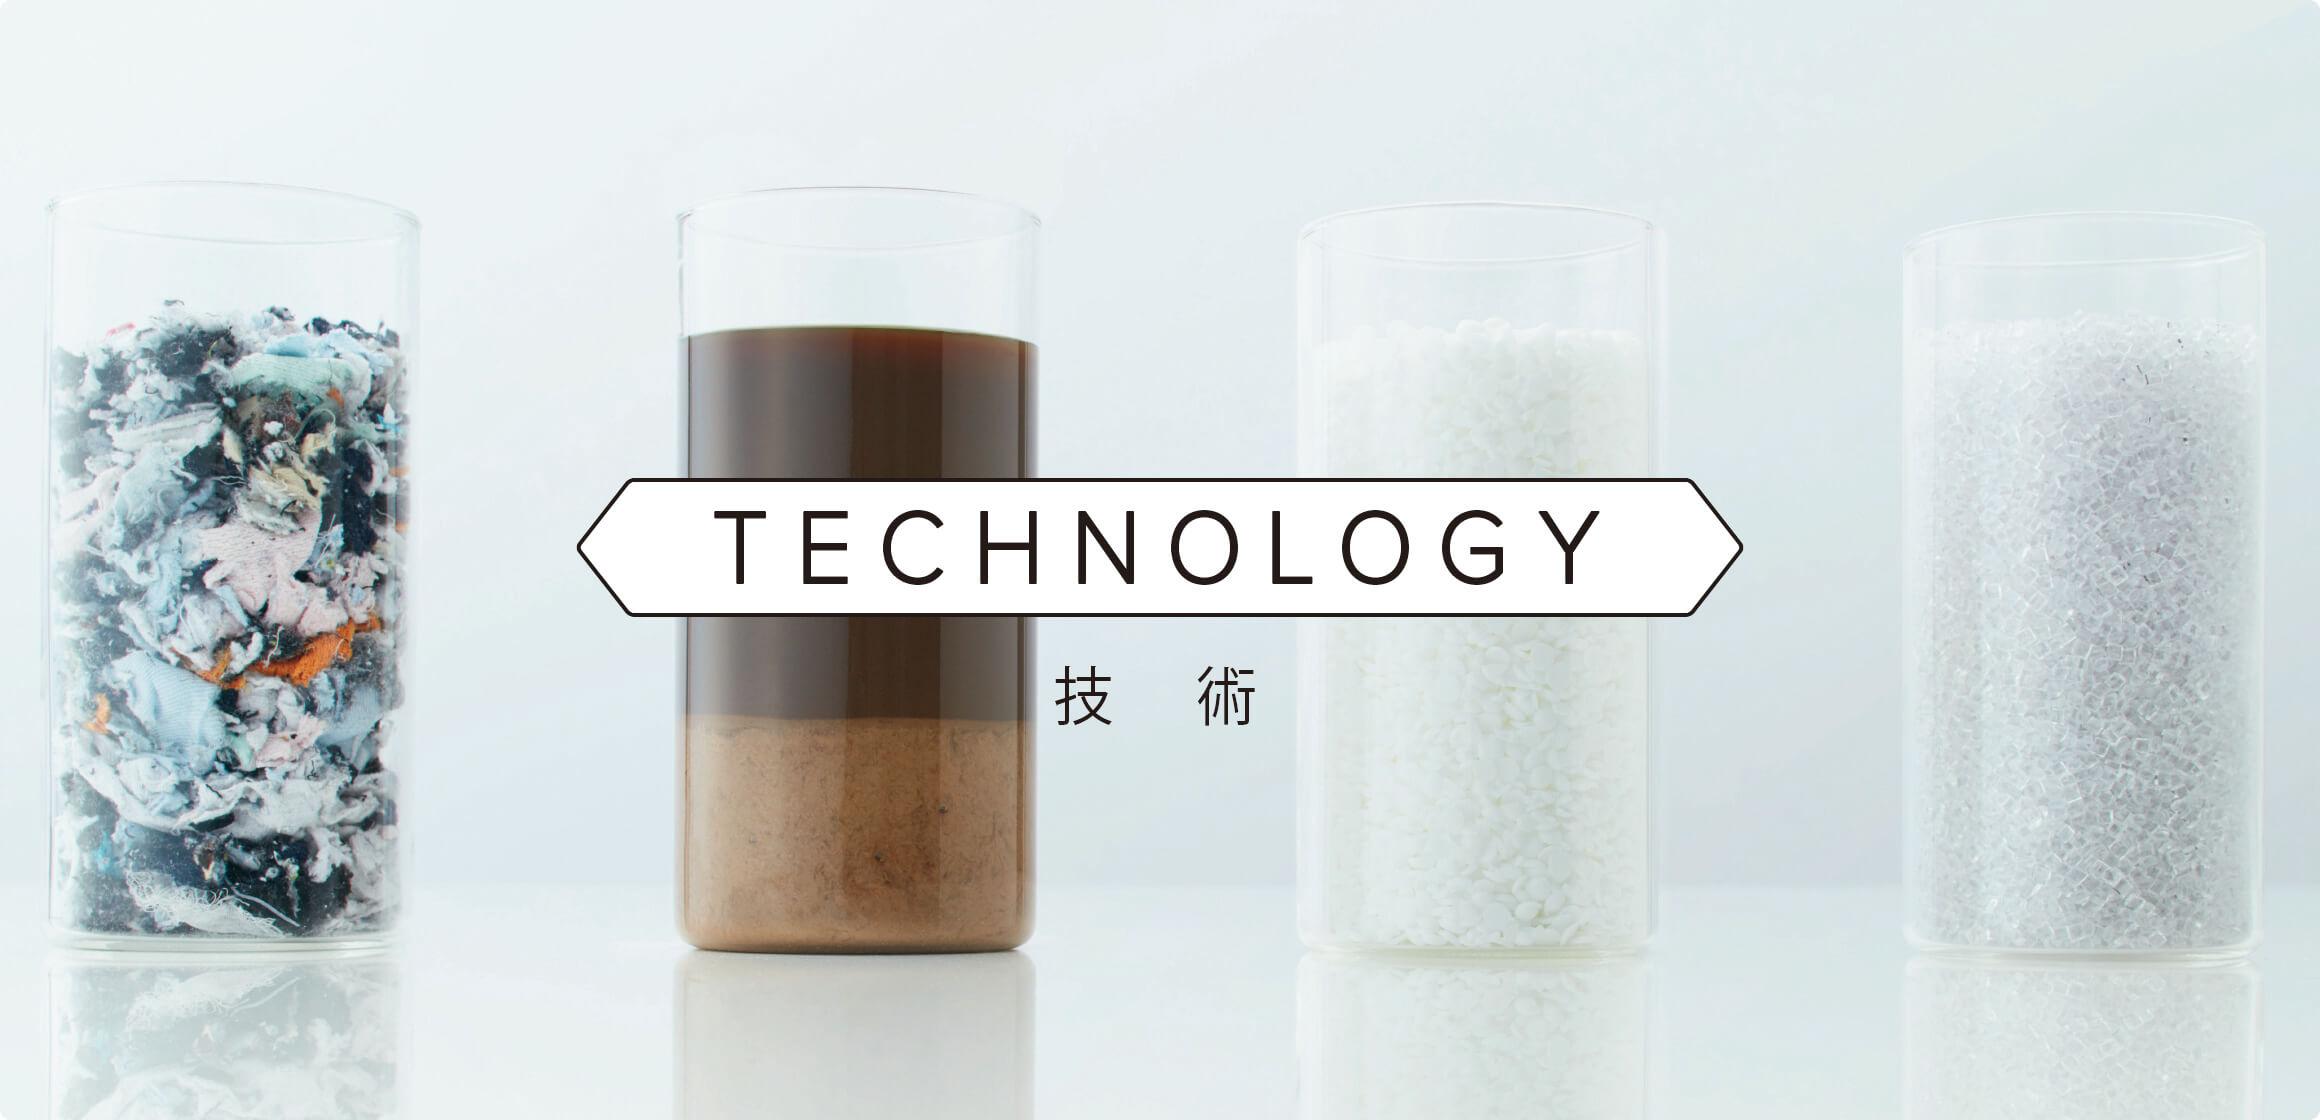 TECHNOLOGY 技術